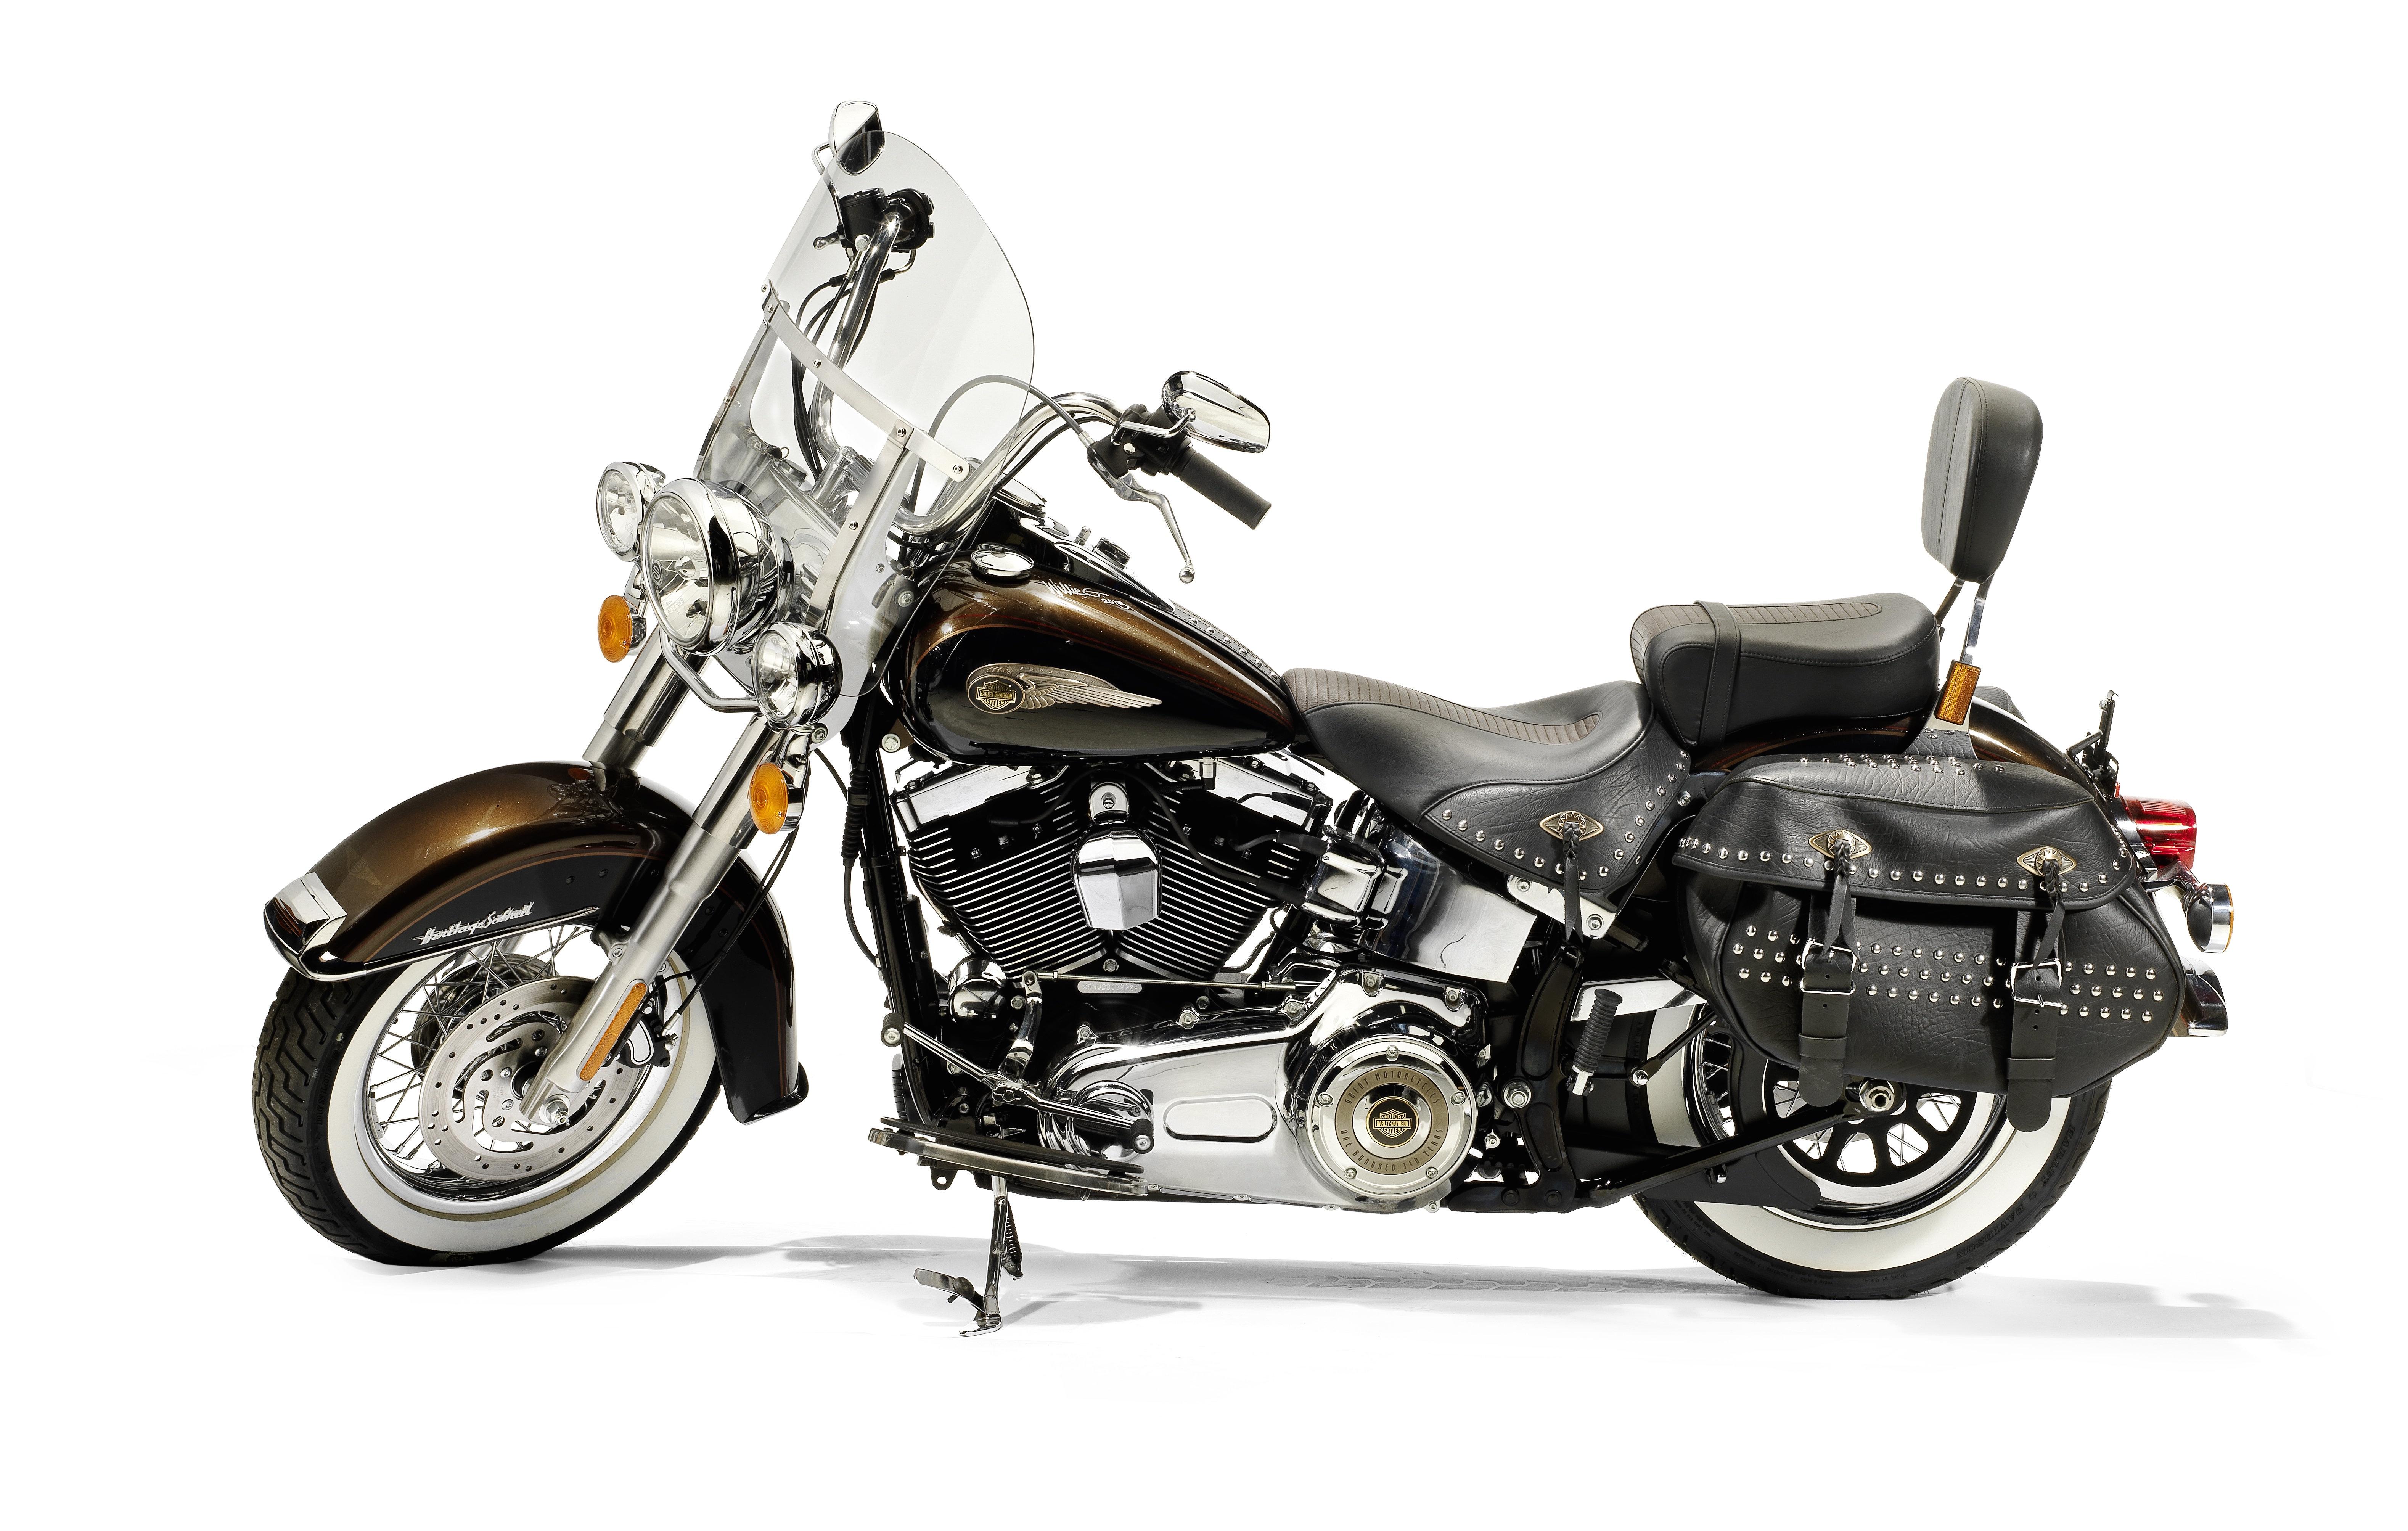 The Pope's Harley Davidson 1,690cc FLSTC 103 Heritage Softail ...